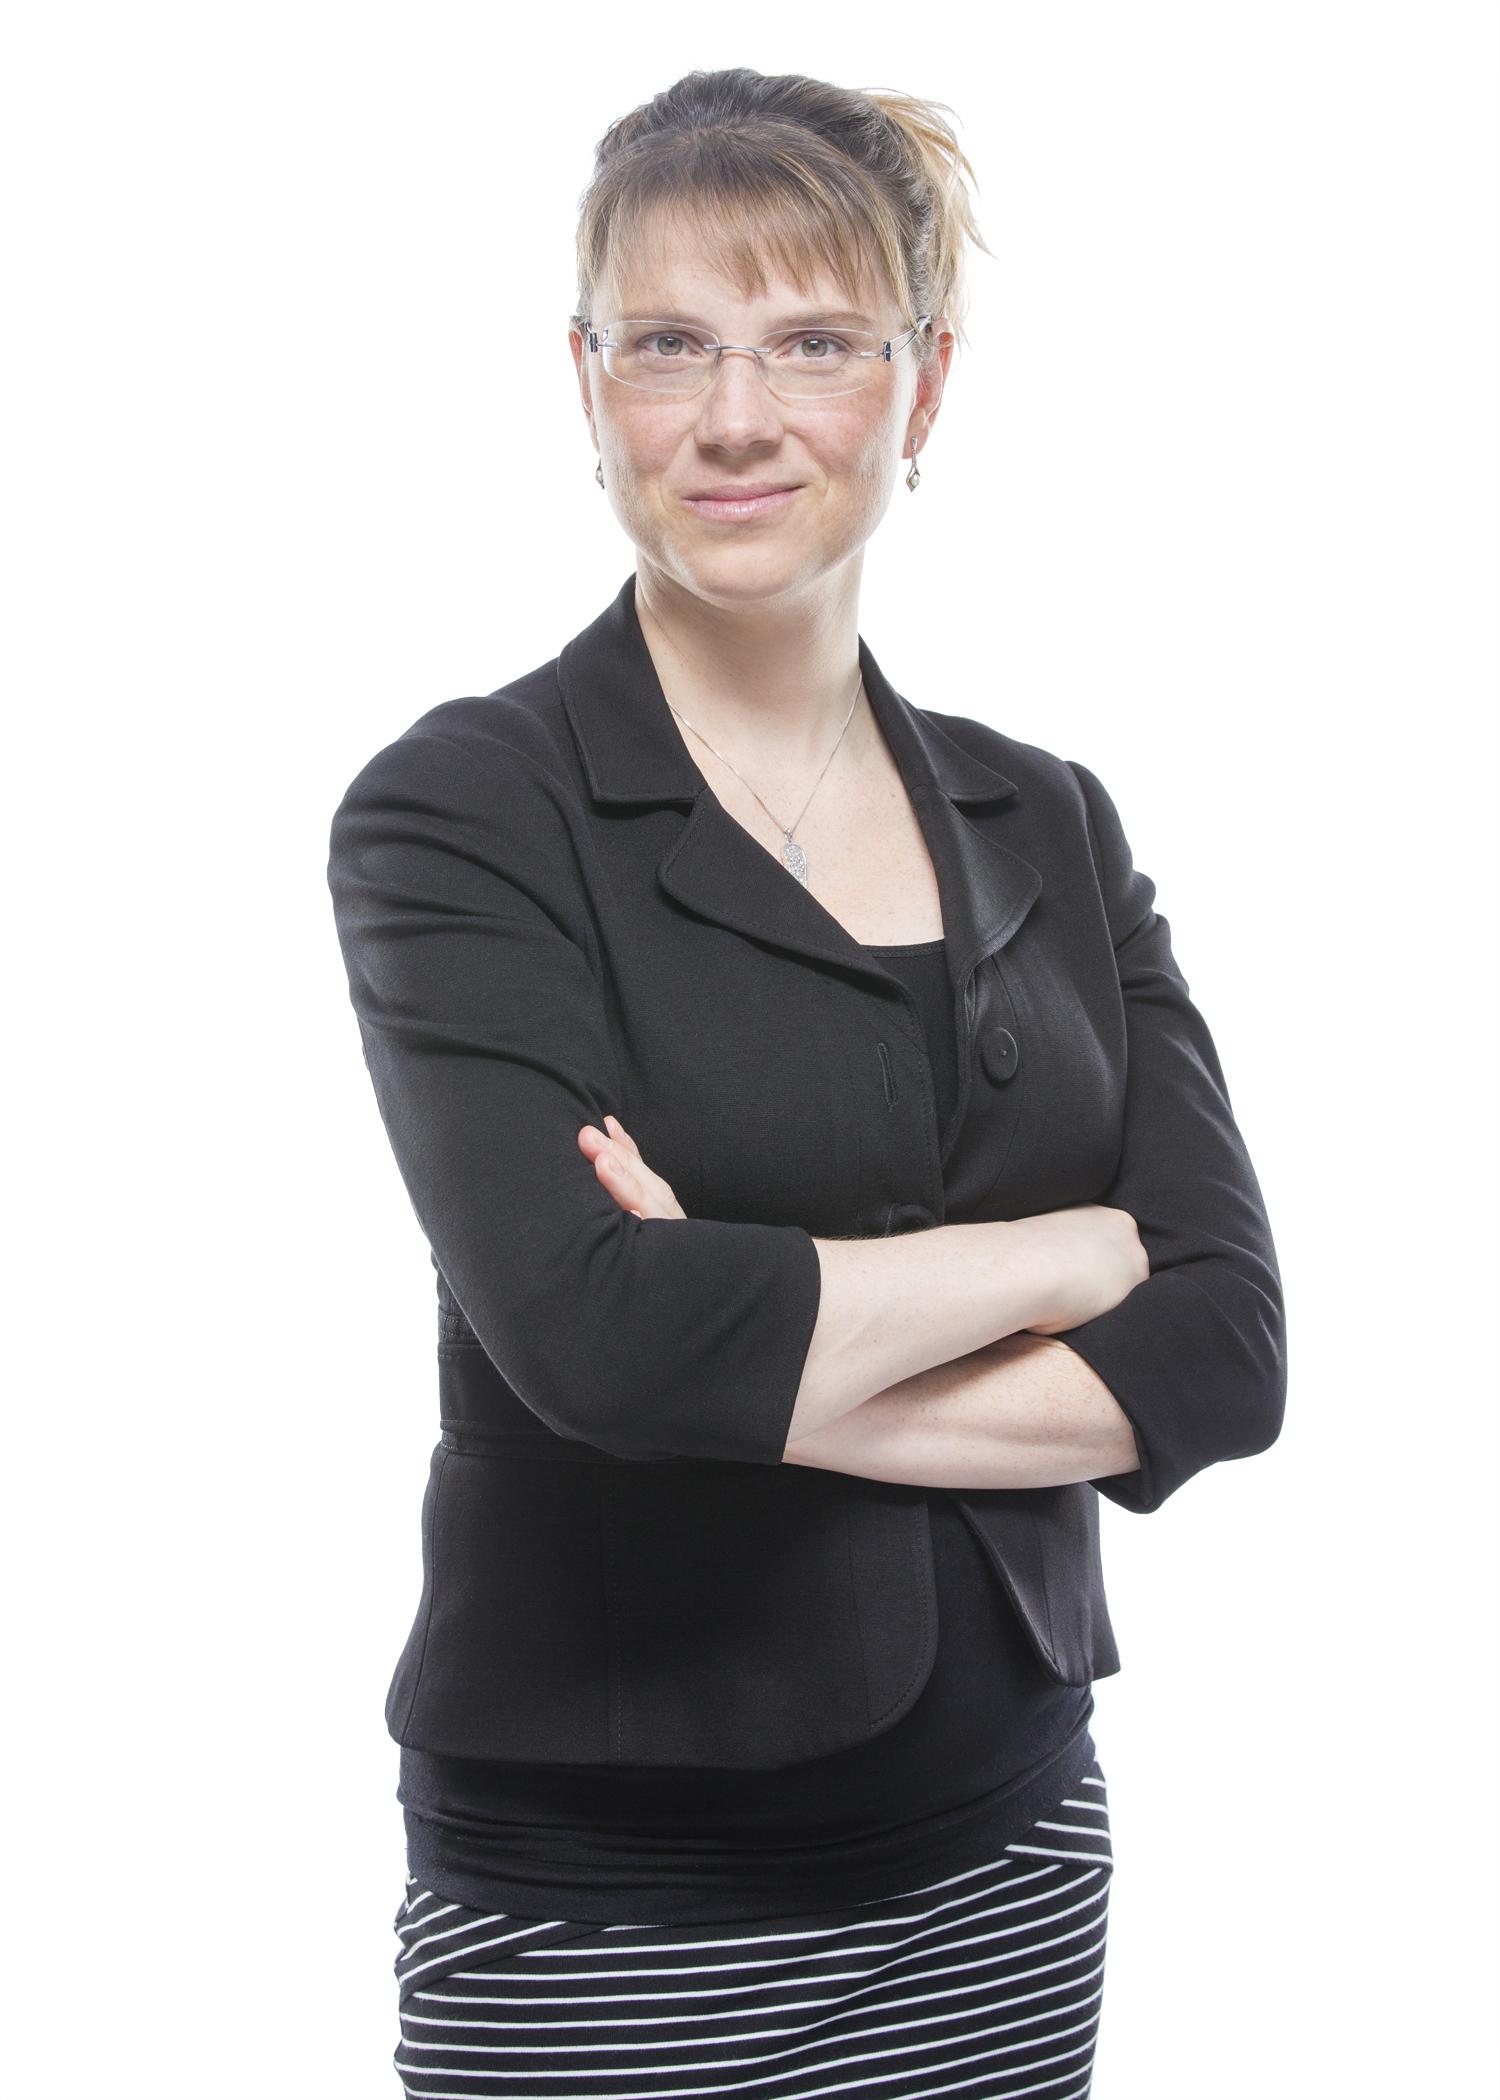 Cindy Vaillancourt